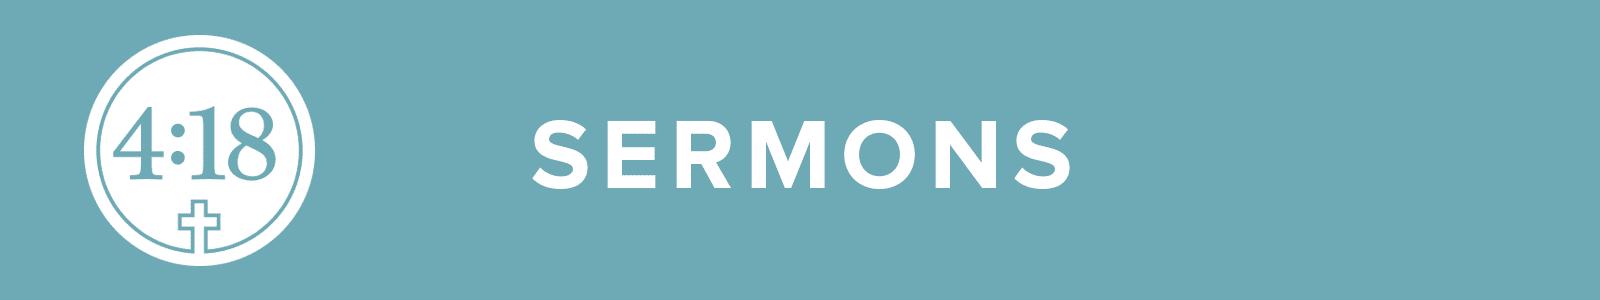 app sermons